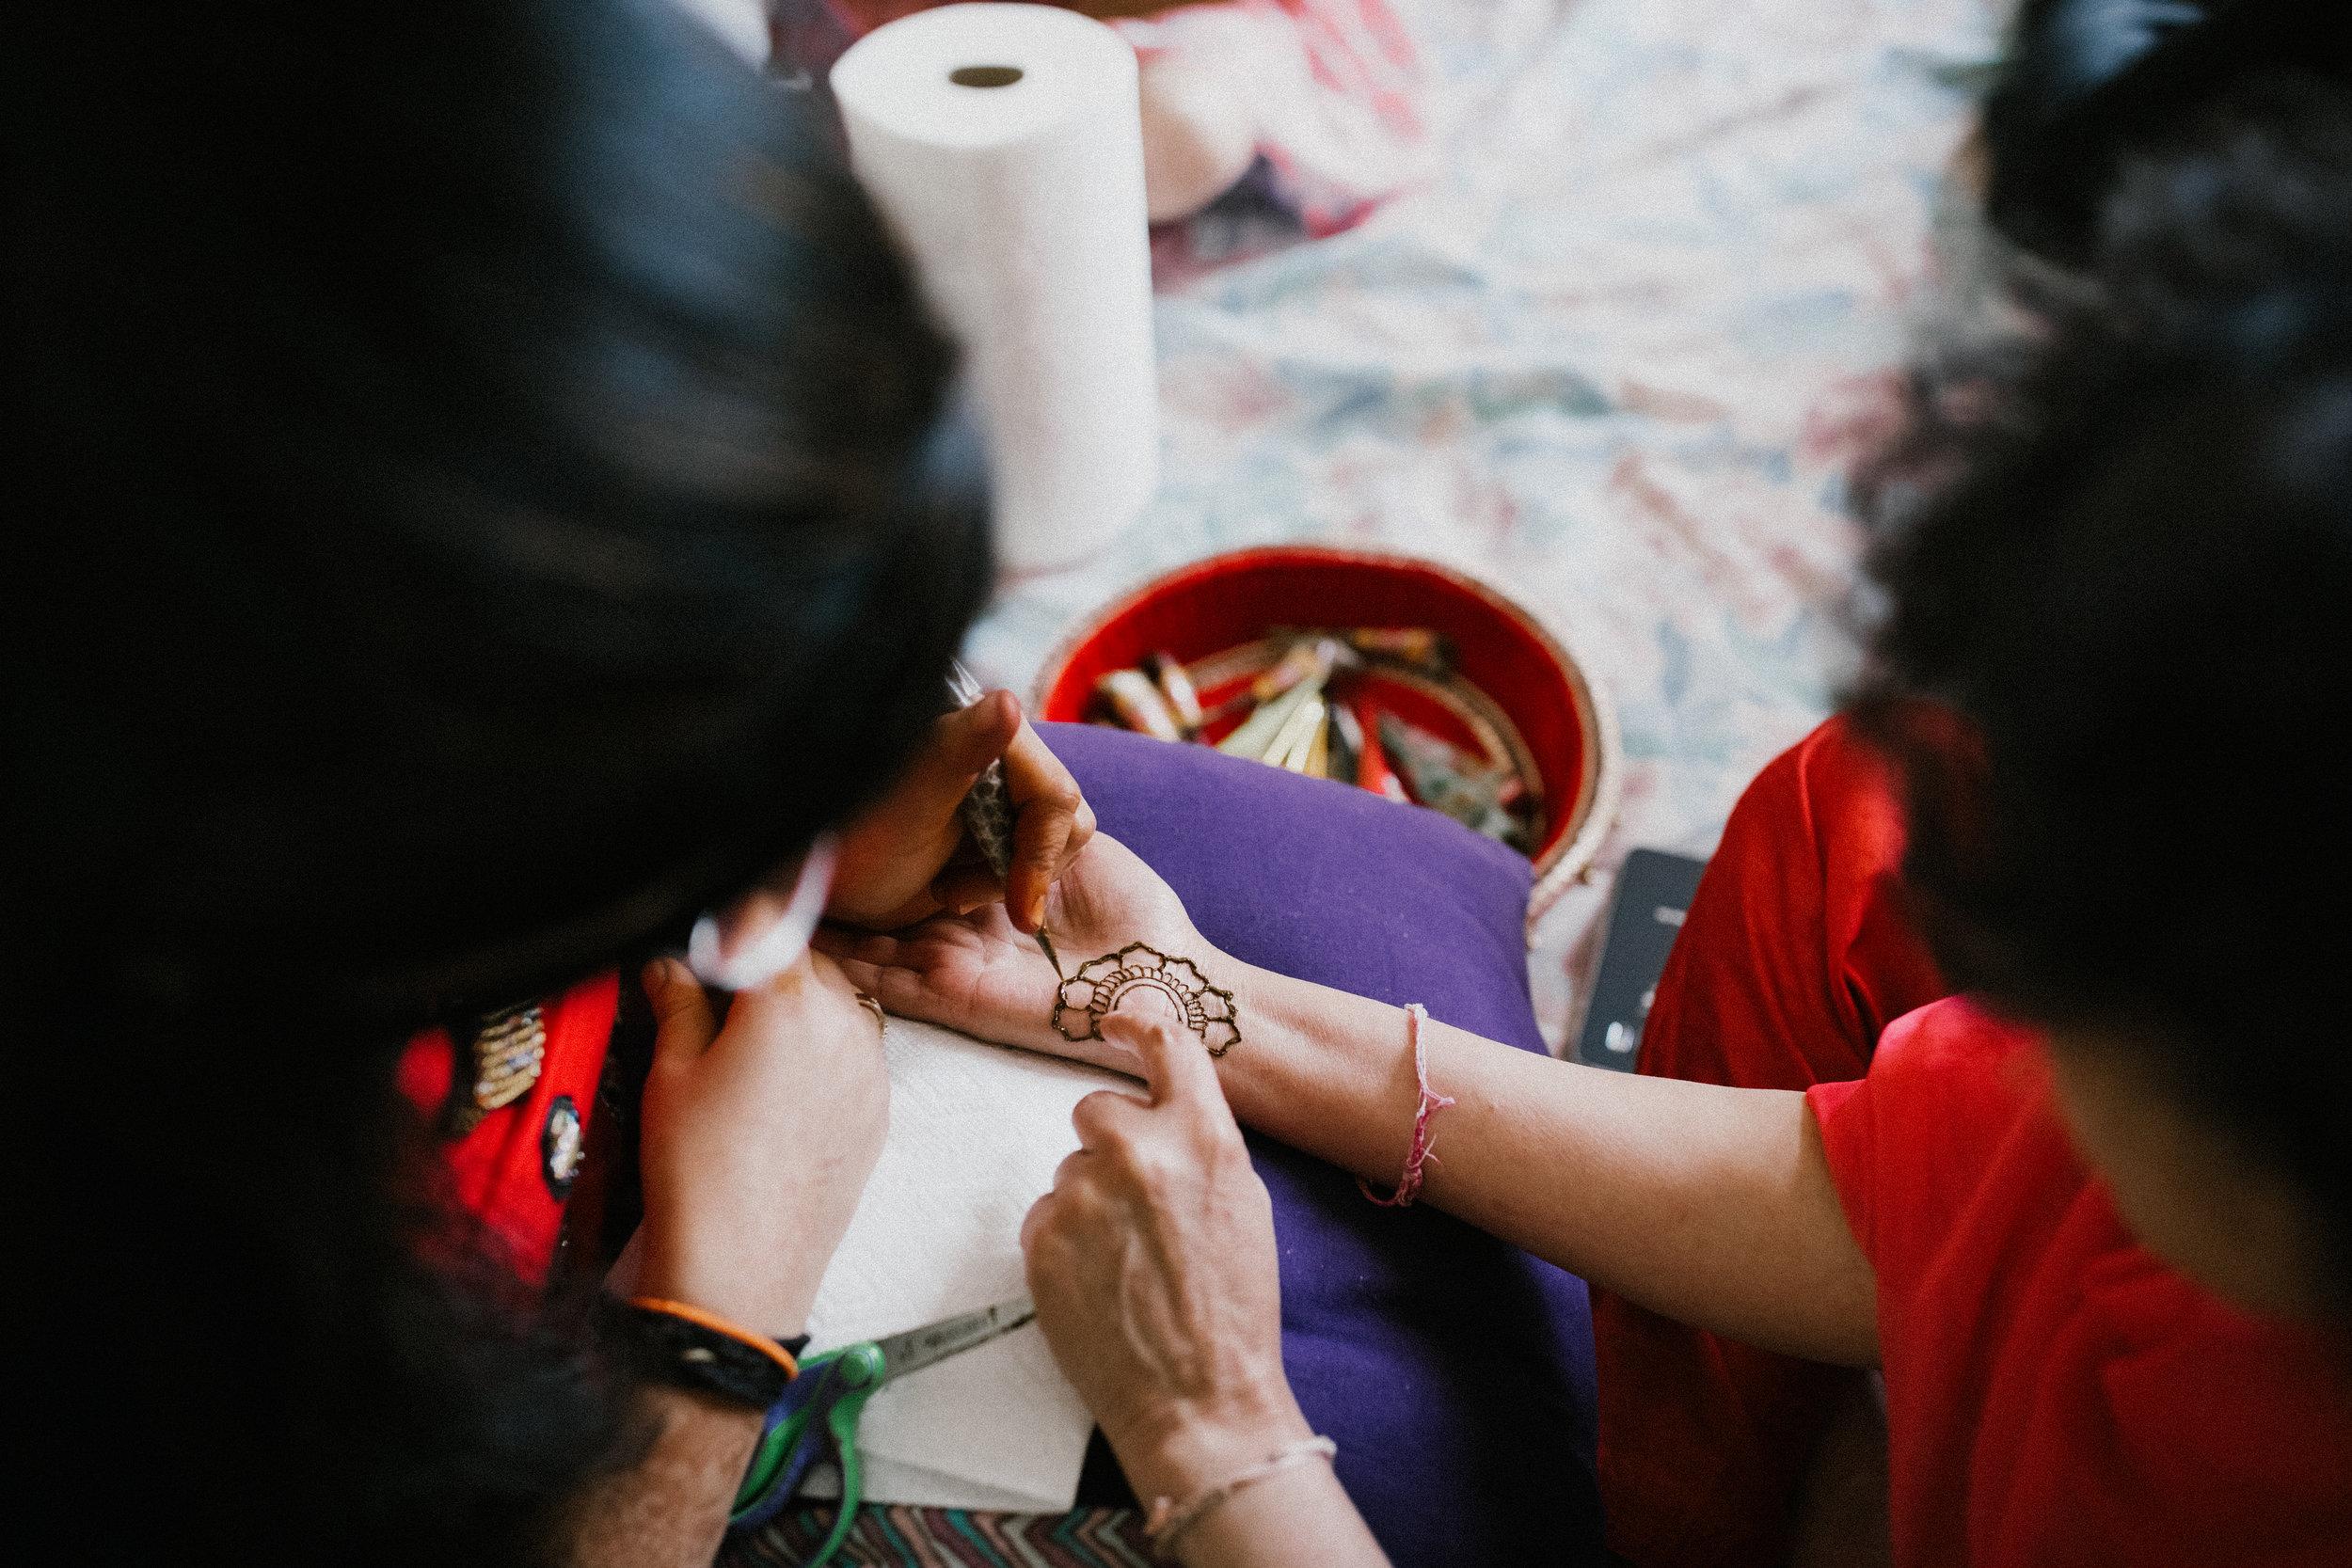 Aparna-Ankit-Patel-Mehndi-Wedding-Photos-0023.jpg